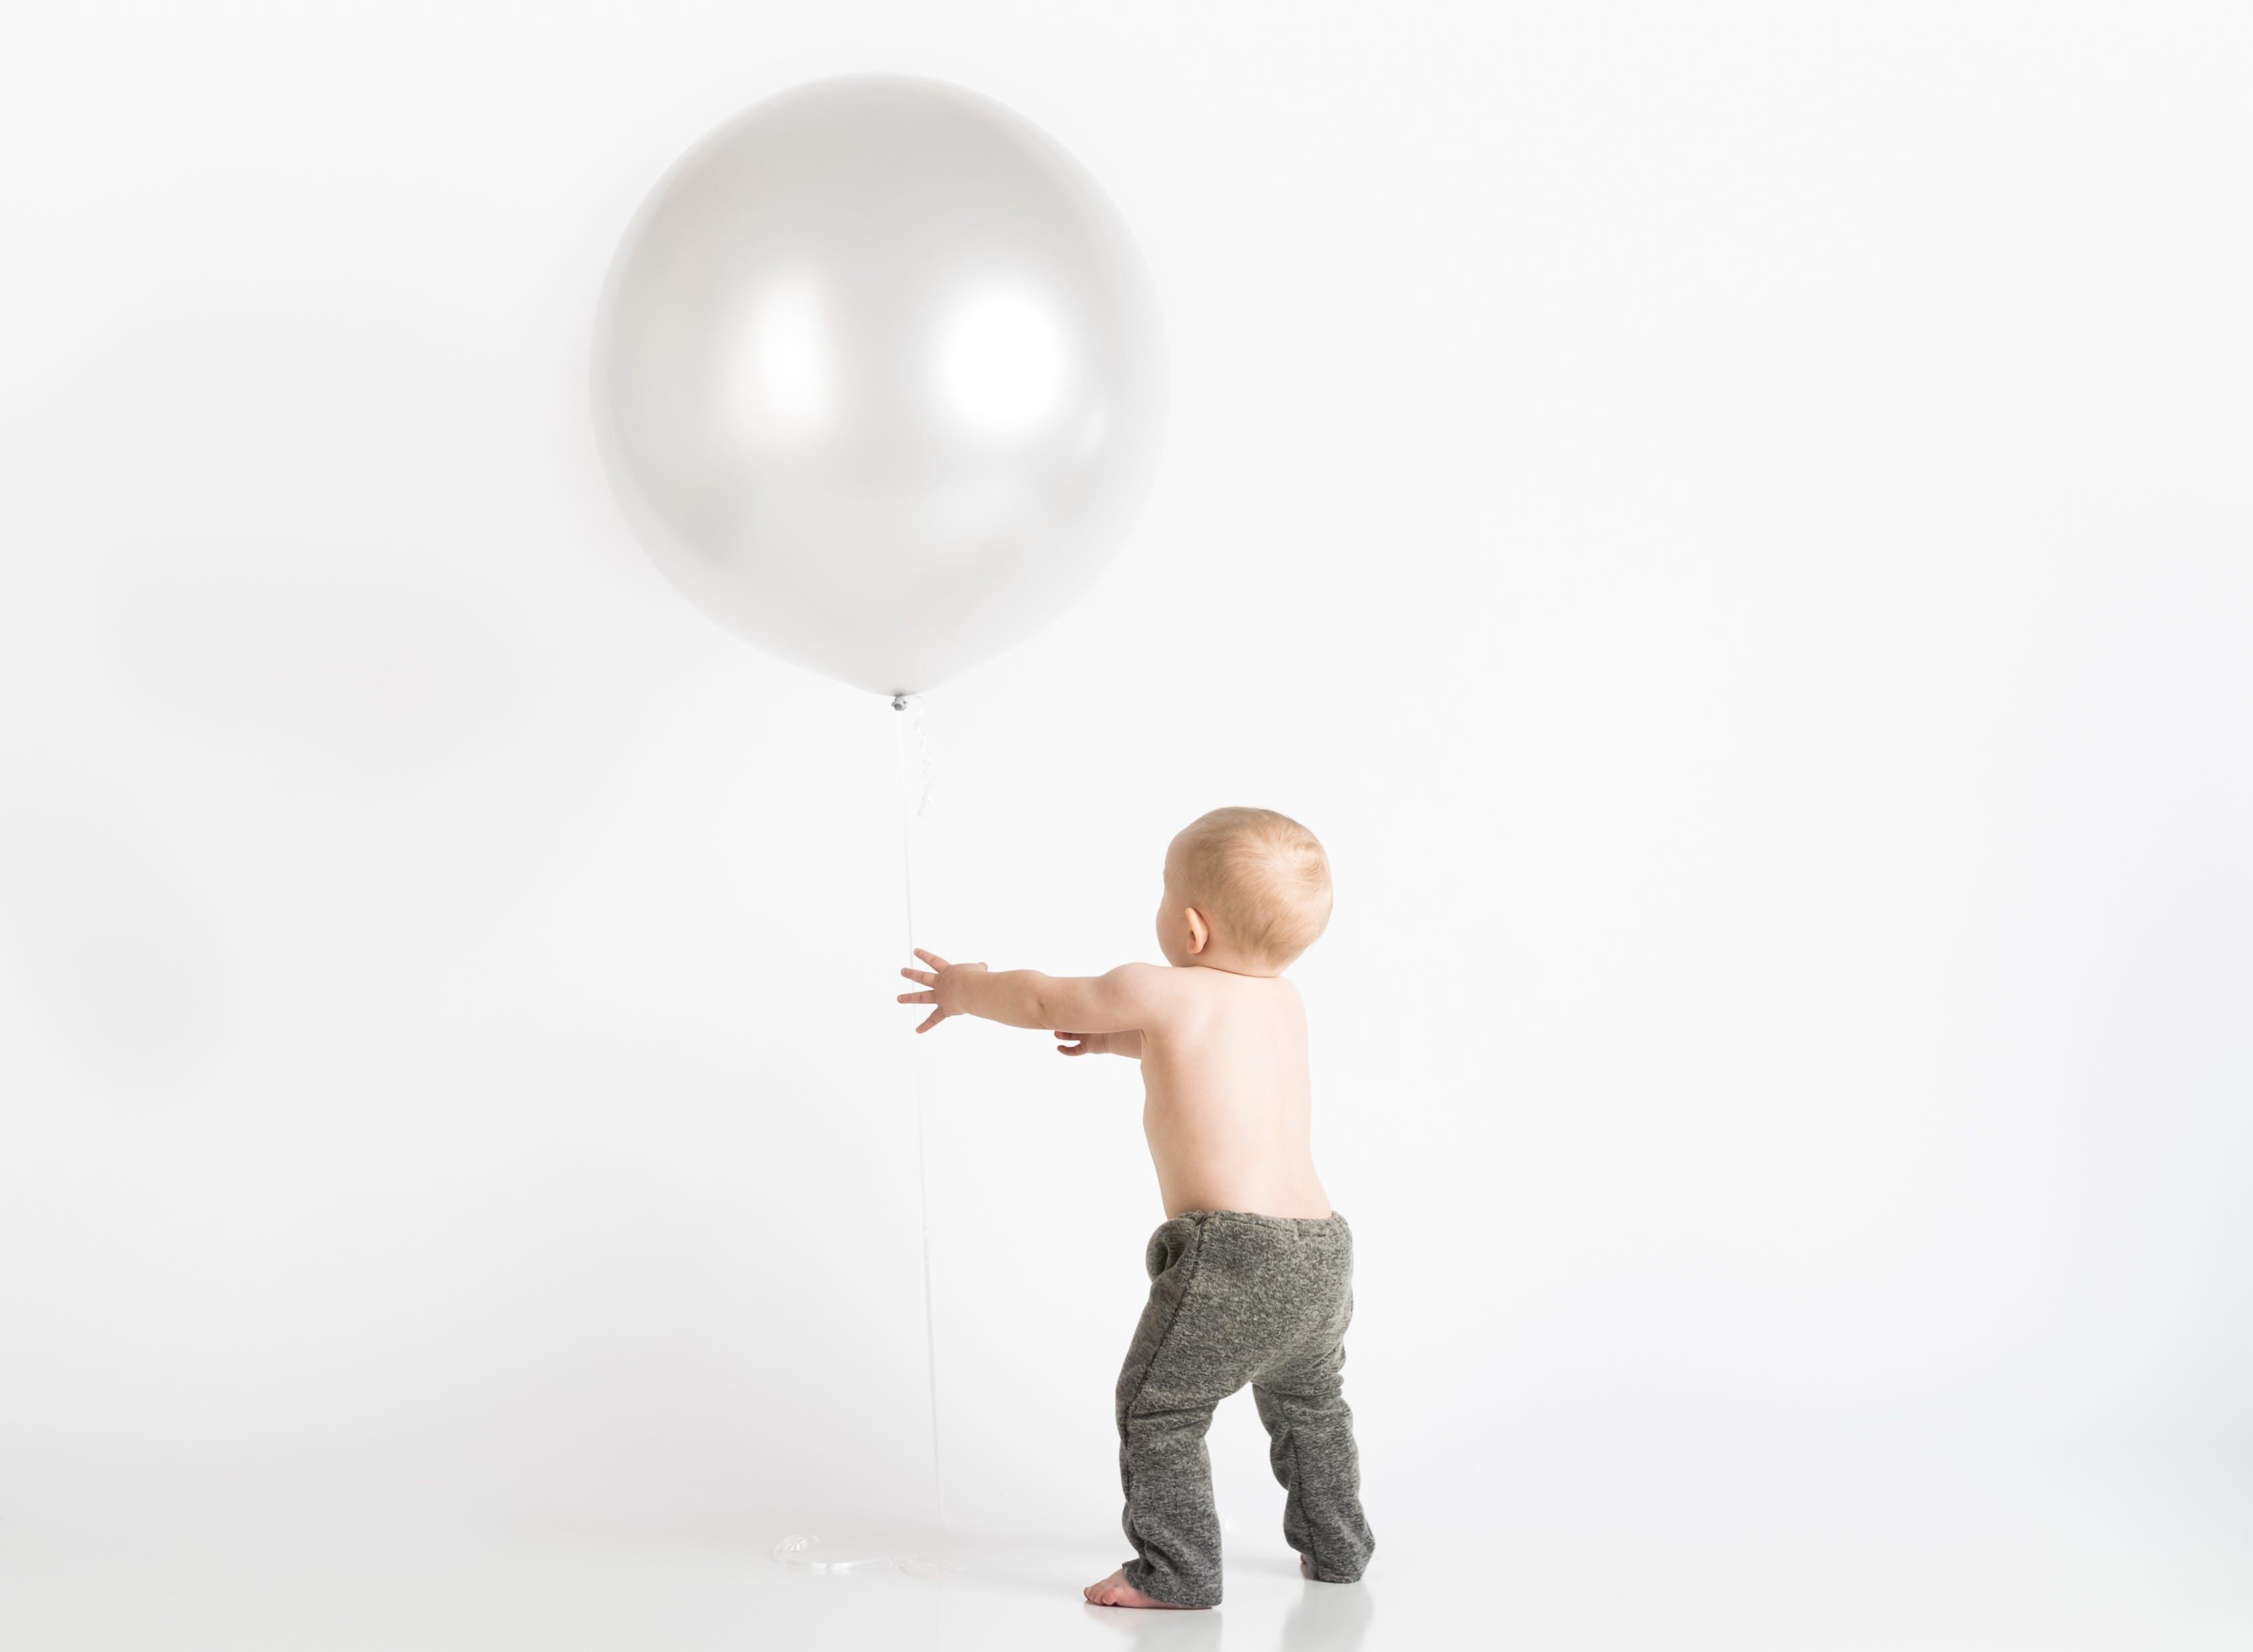 baby-ballon, süßes baby